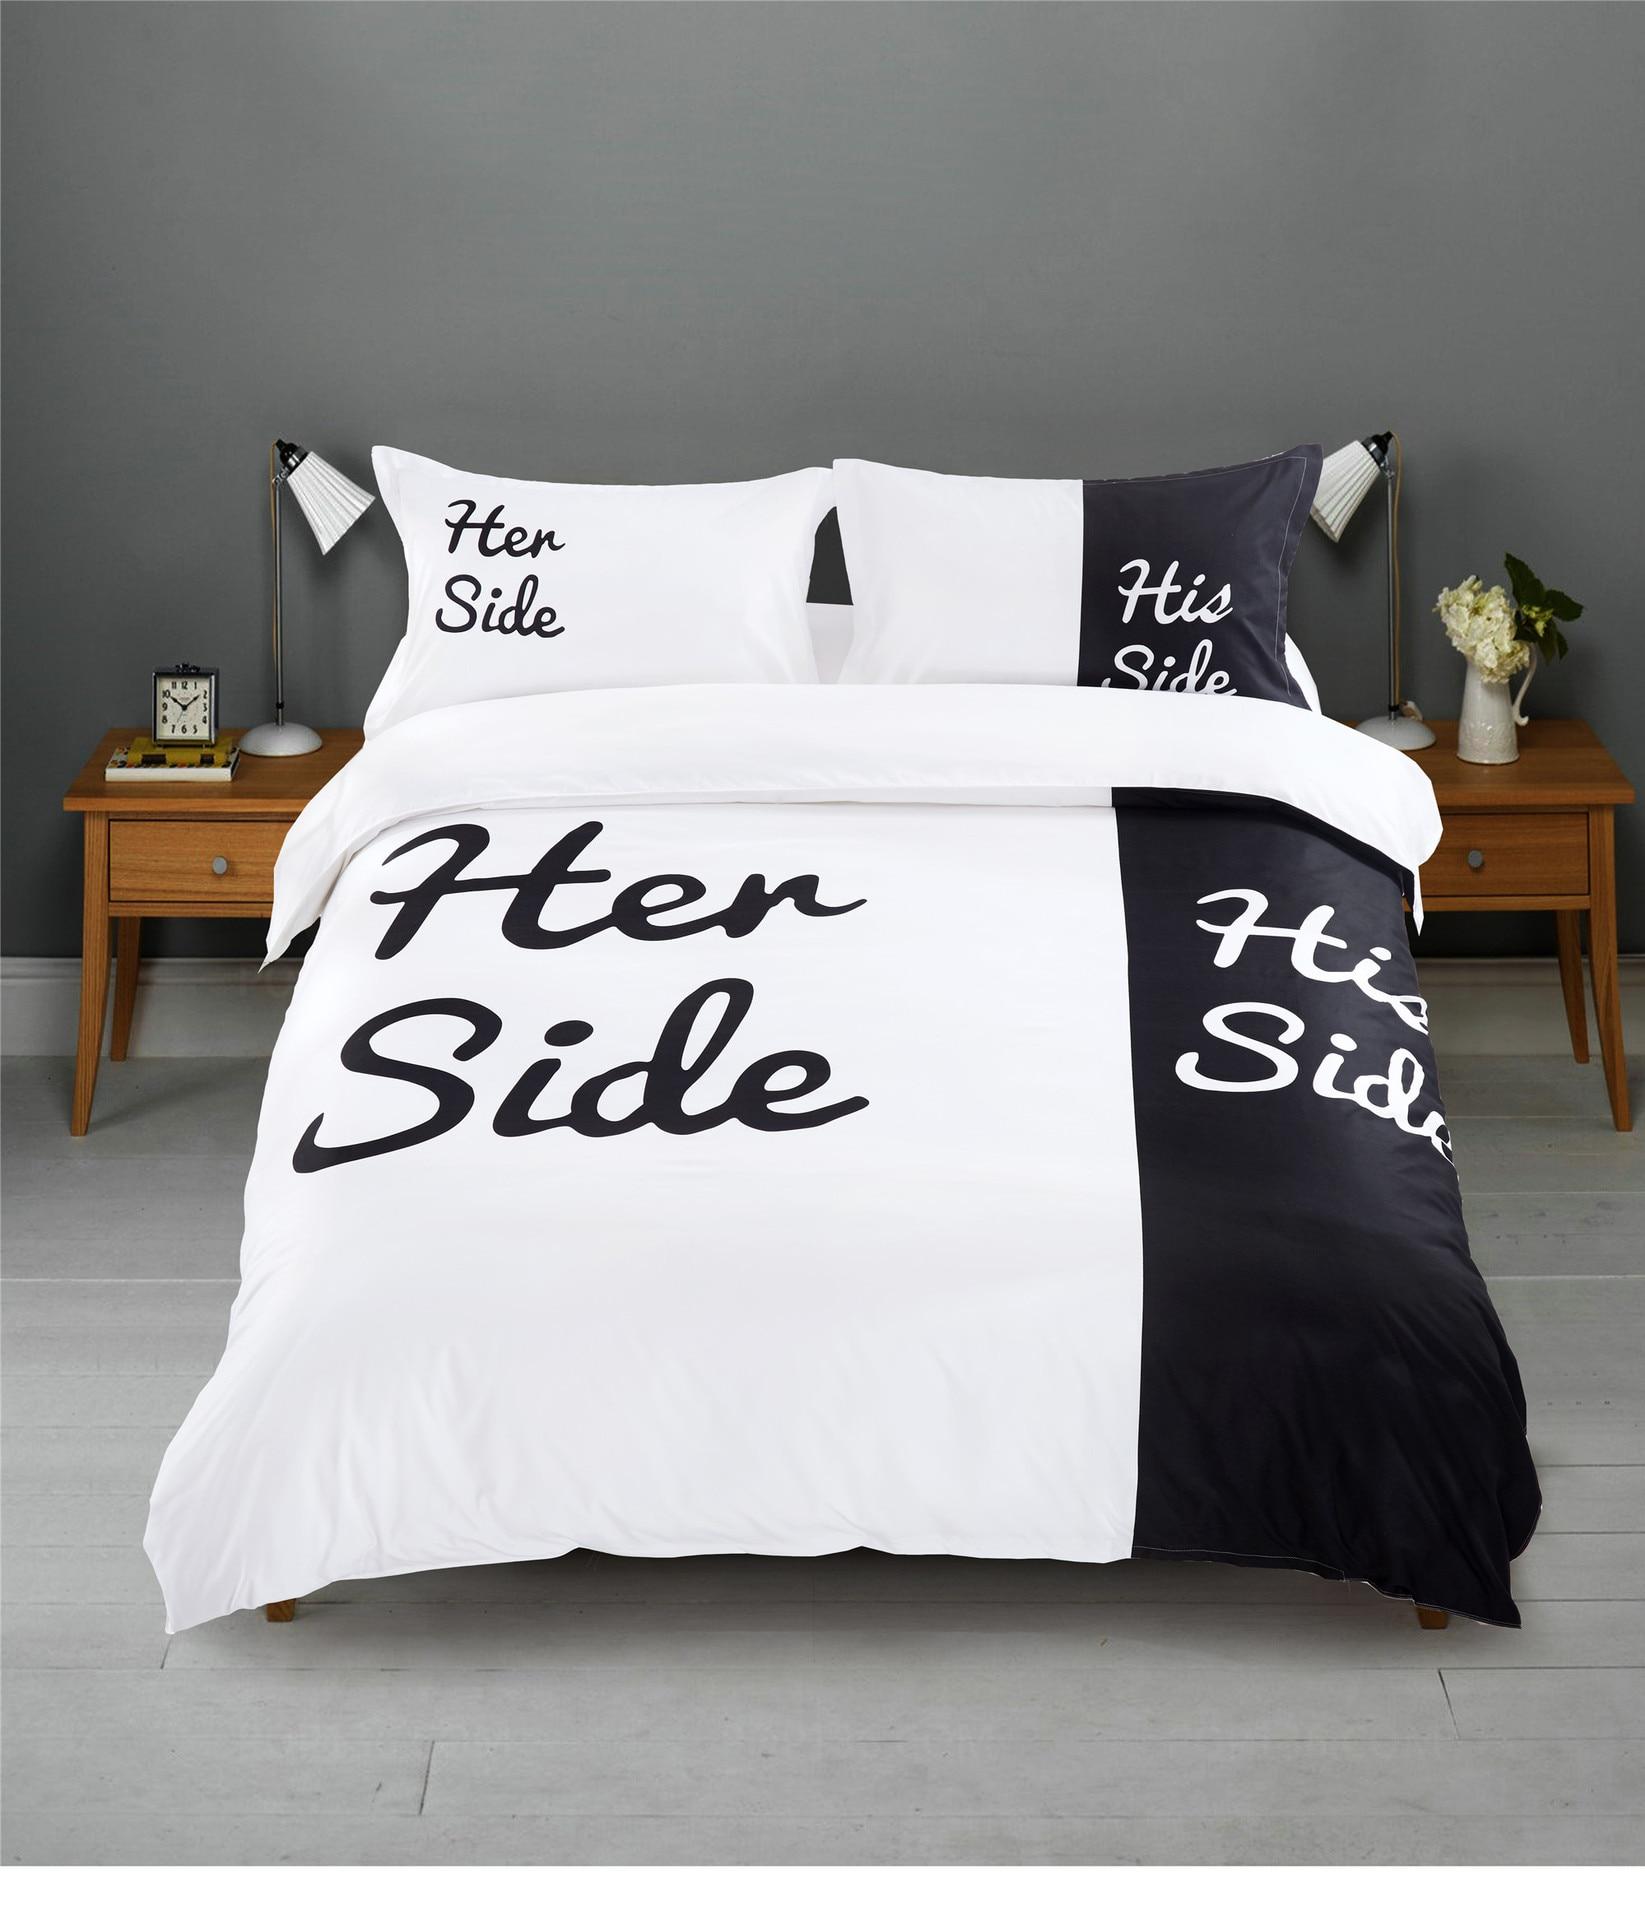 Letter Print Duvet Cover Set King Queen Size Bed Sheet Bedding Set Sexy Herside Hisside Black White Bedroom Bed Linen